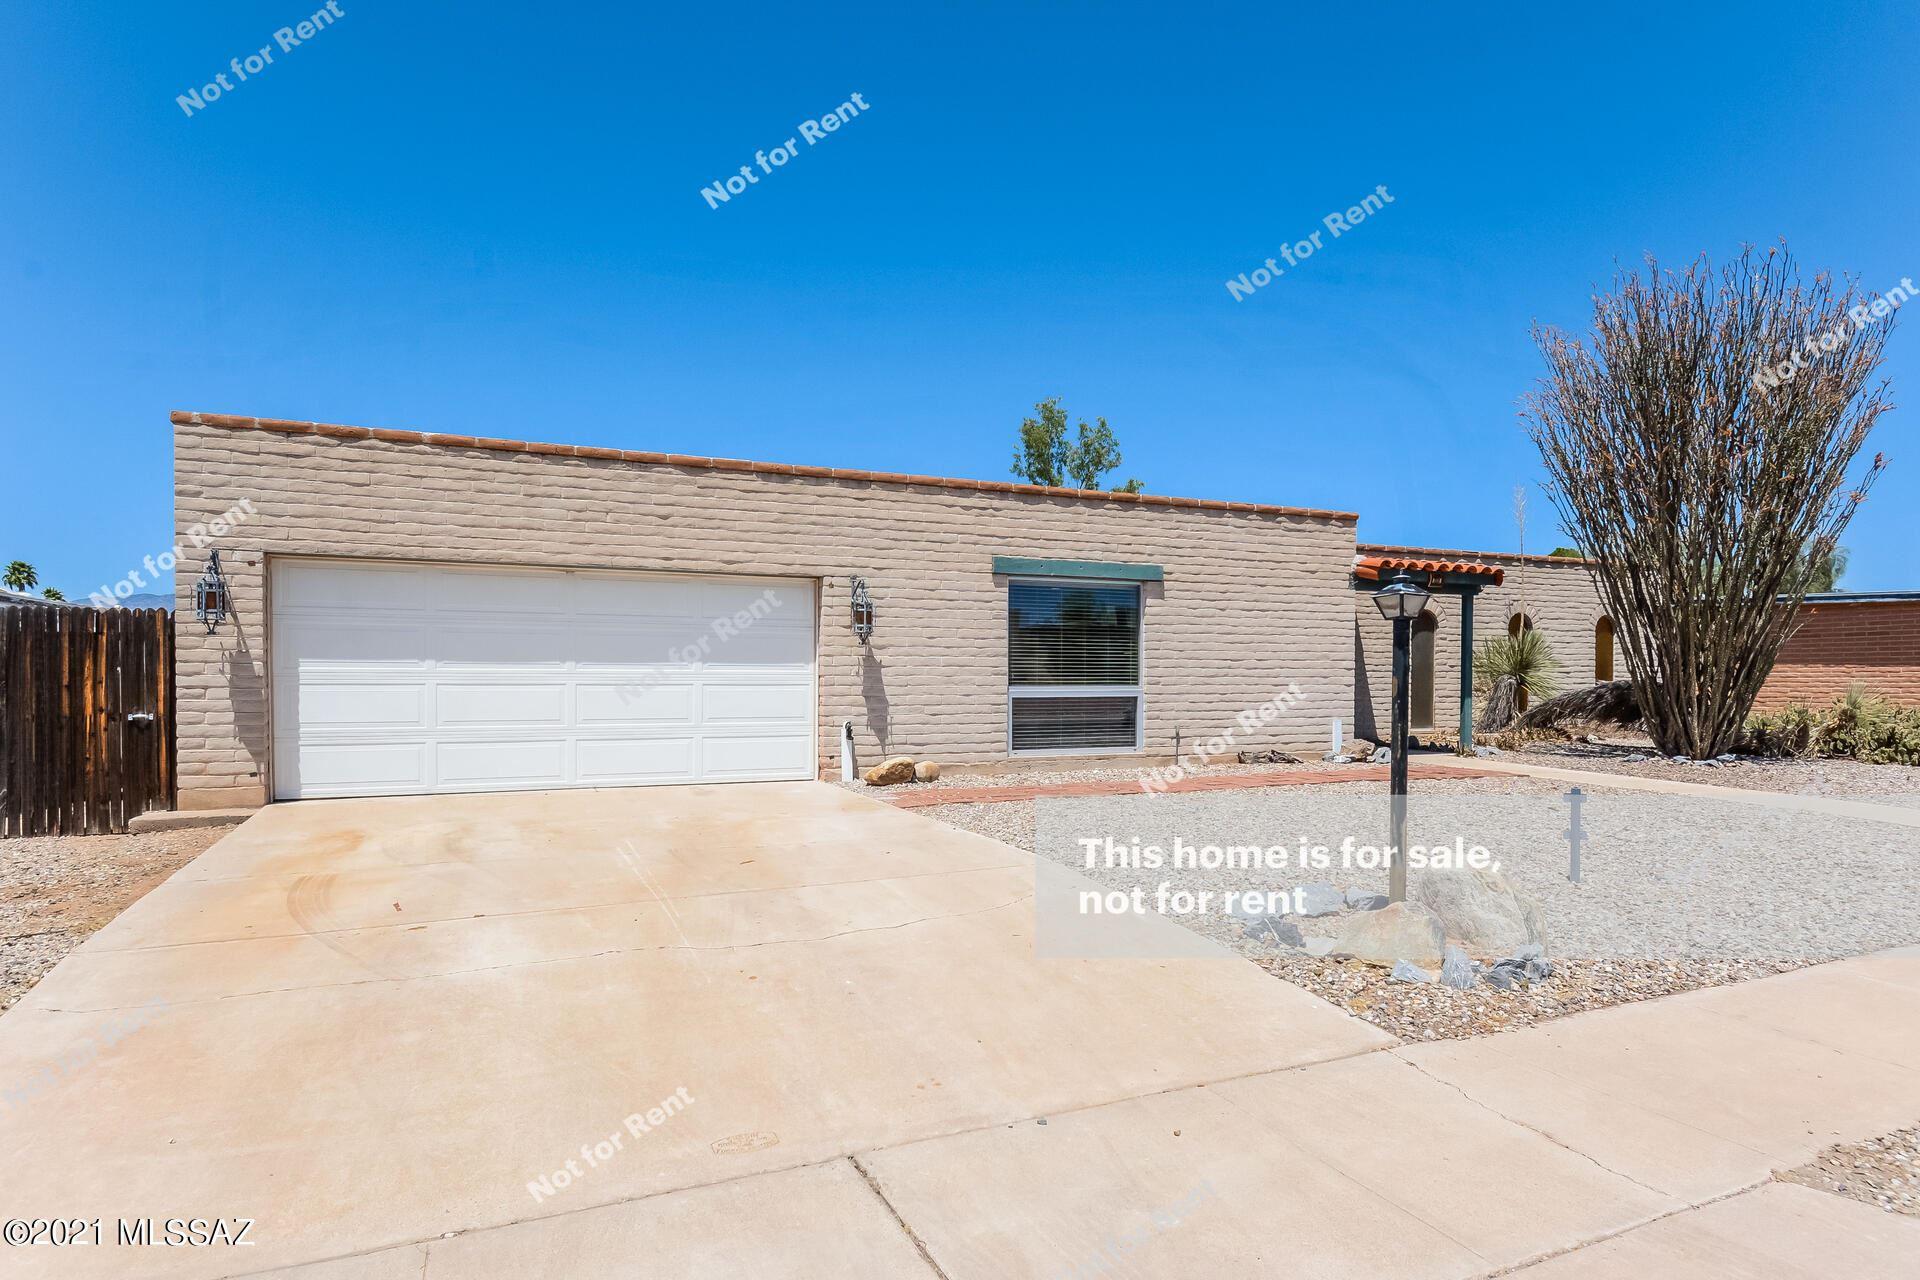 7531 E 39Th Street, Tucson, AZ 85730 - MLS#: 22112244